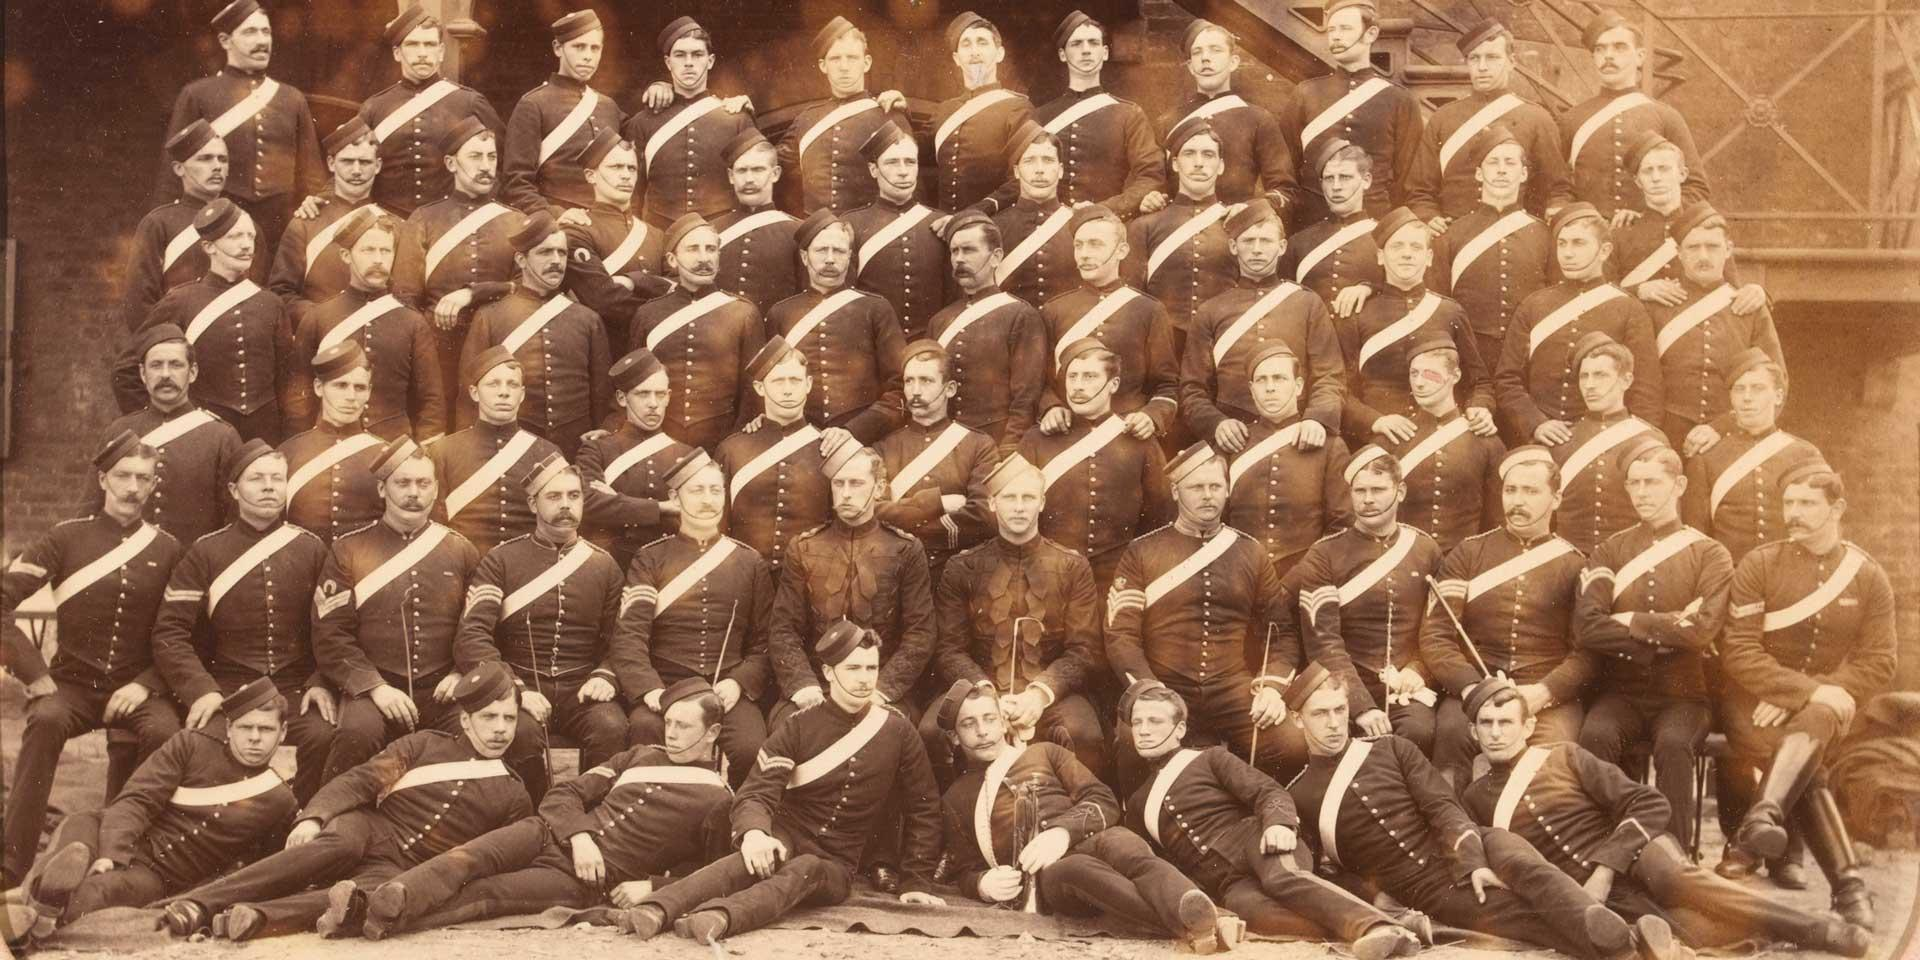 Members of the 1st (Royal) Dragoons in stable dress, Aldershot, 1886